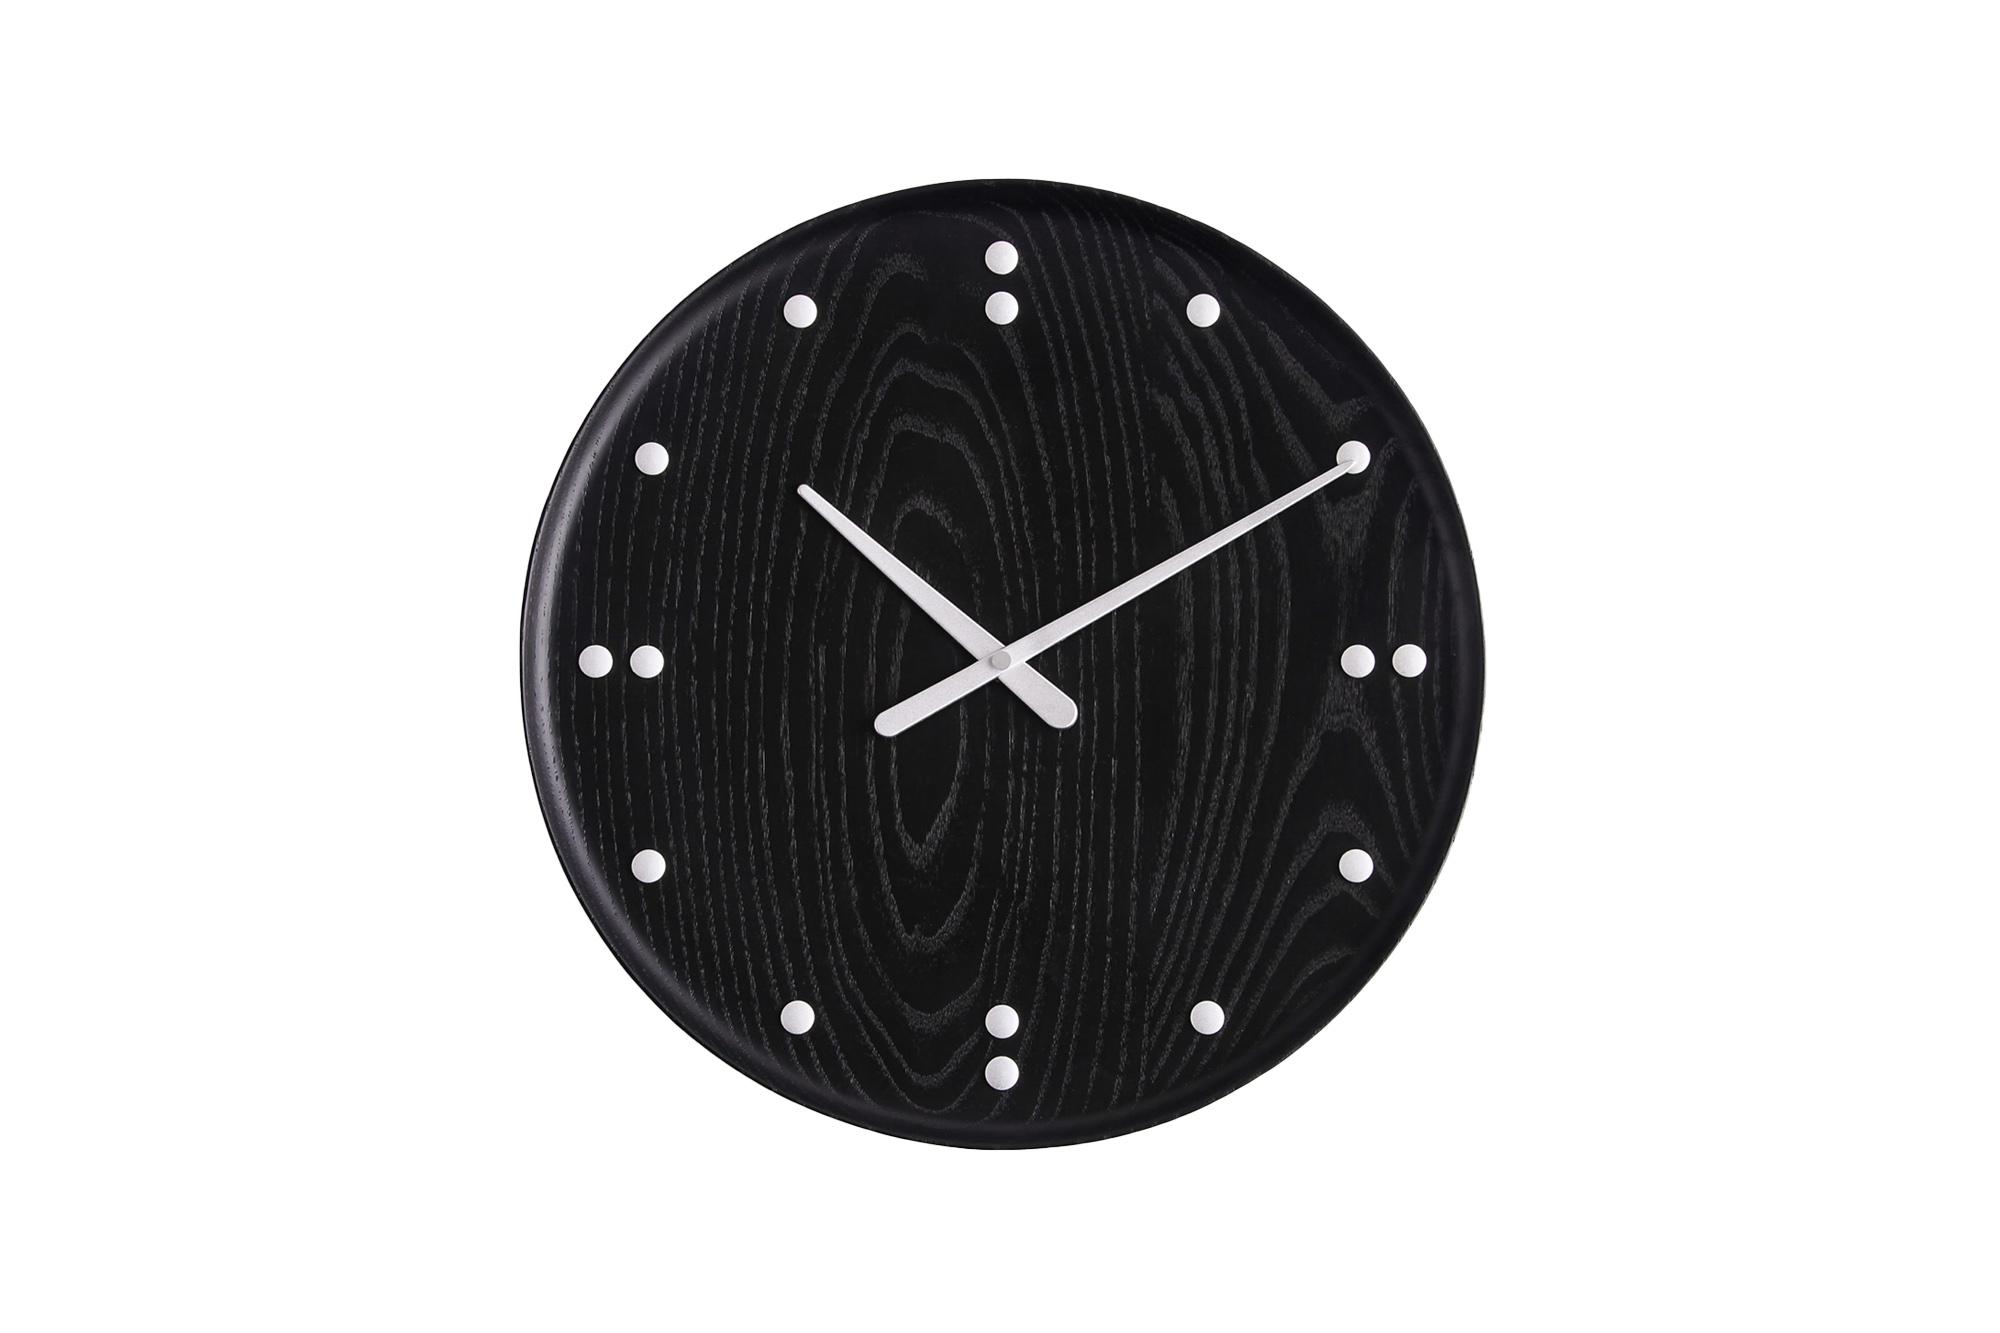 Finn Juhl United Nations Clock